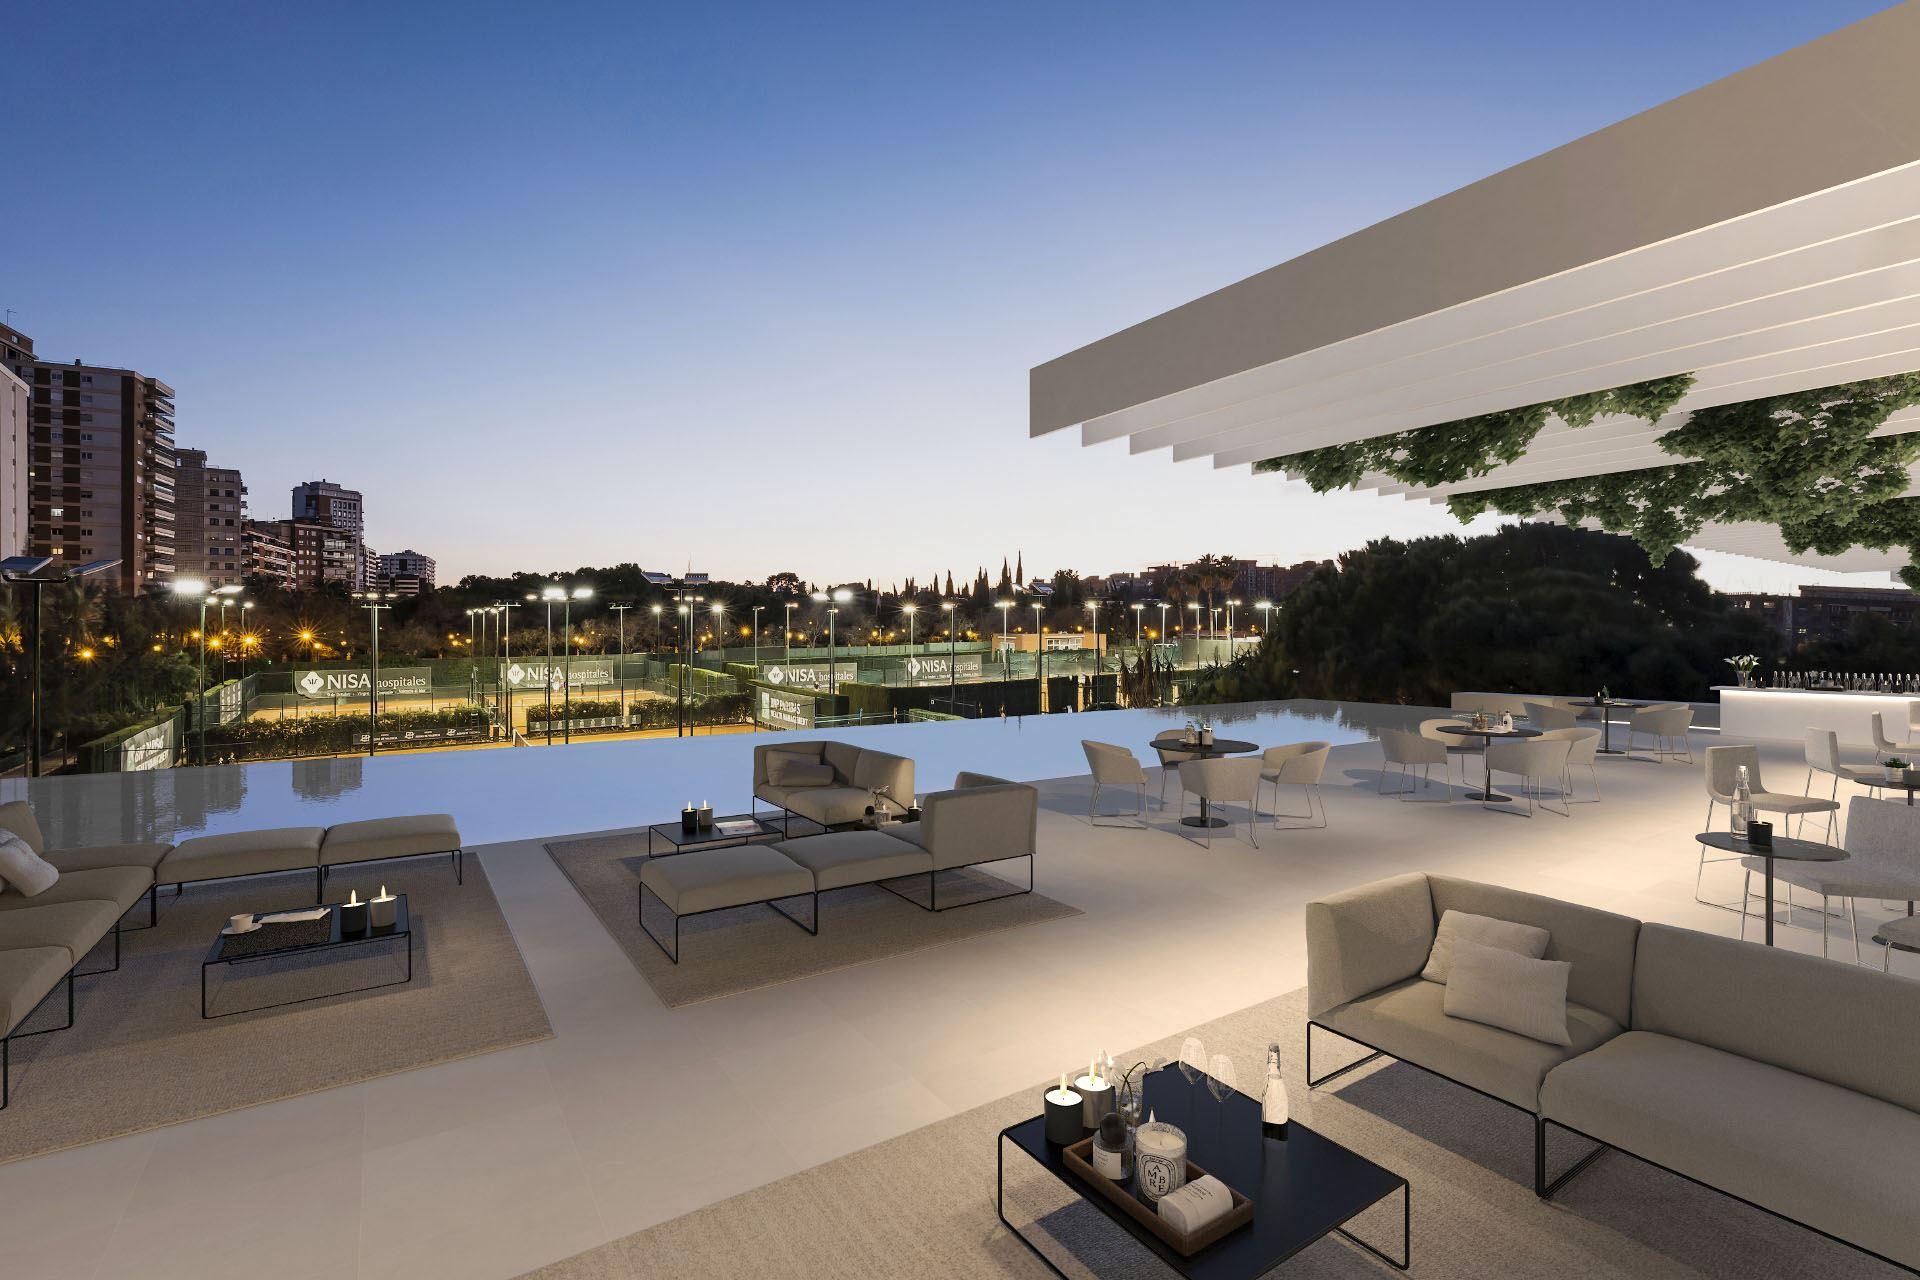 Tennis Club Project - Gallardo Llopis Architecture